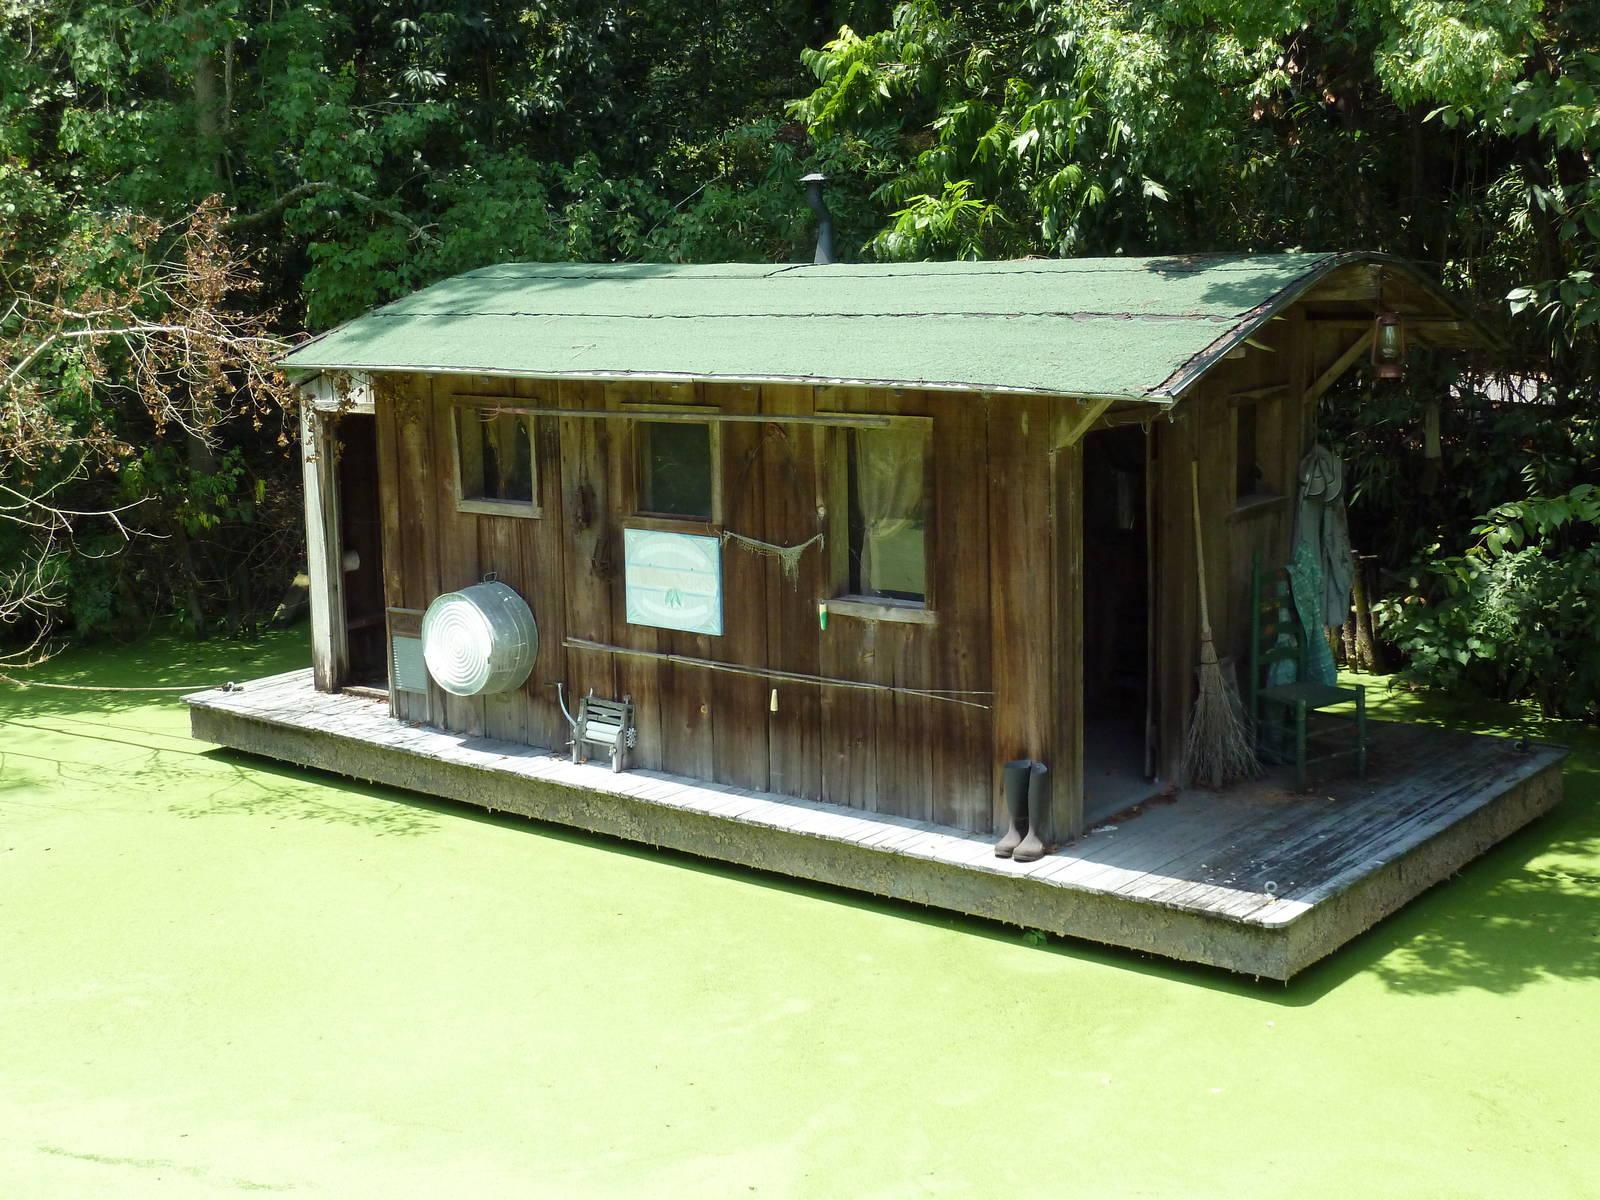 Louisiana Swamp - Alligator Exhibit Houseboat Zoochat